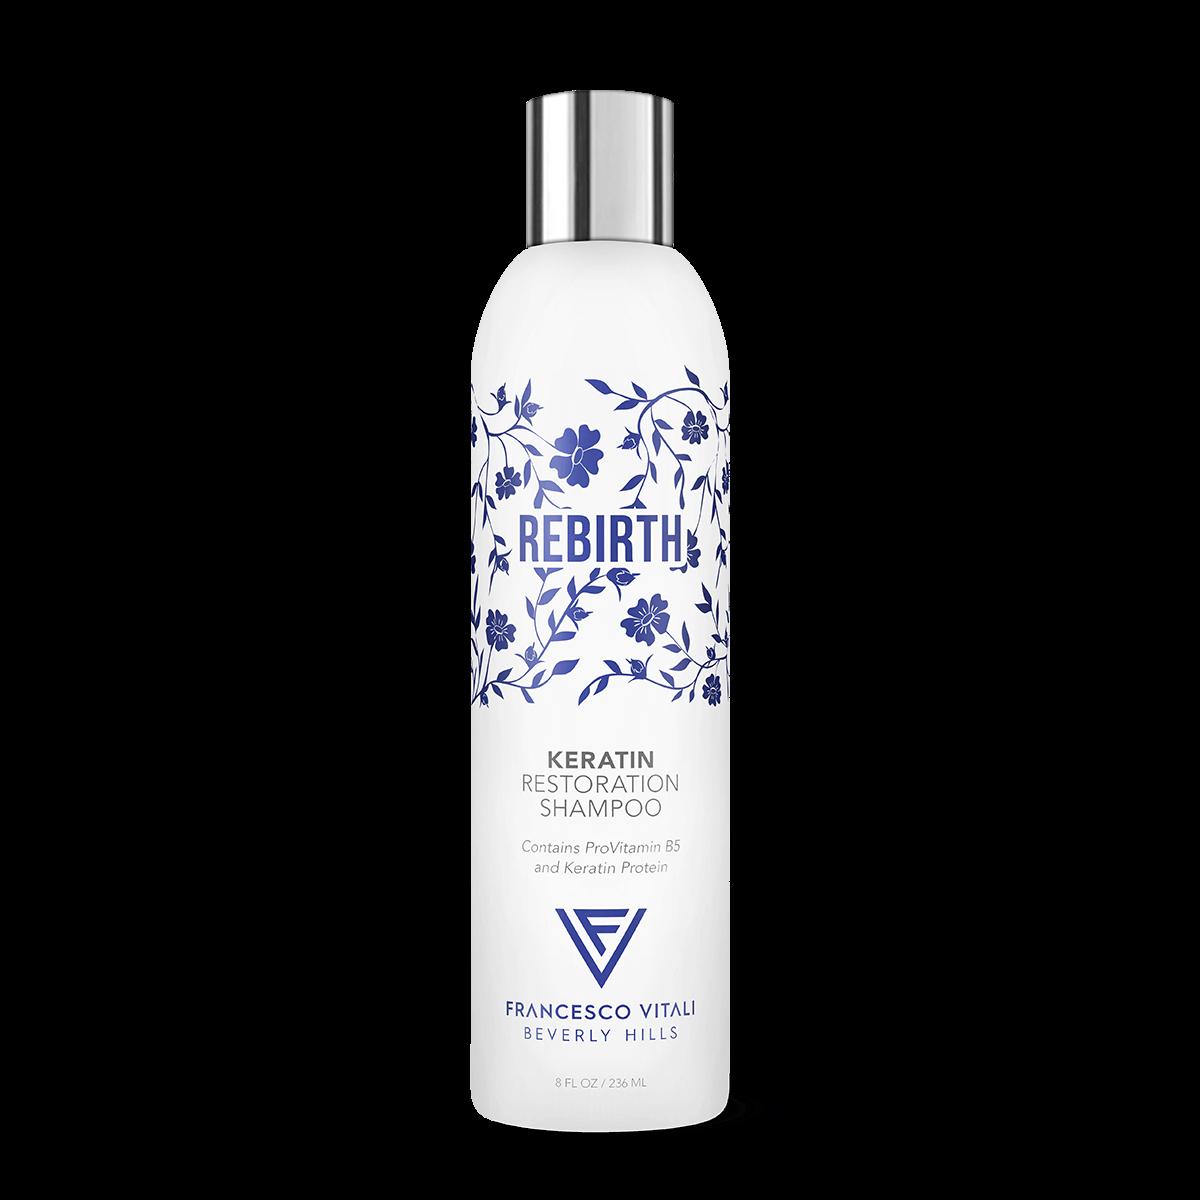 Rebirth Keratin Restoration Shampoo